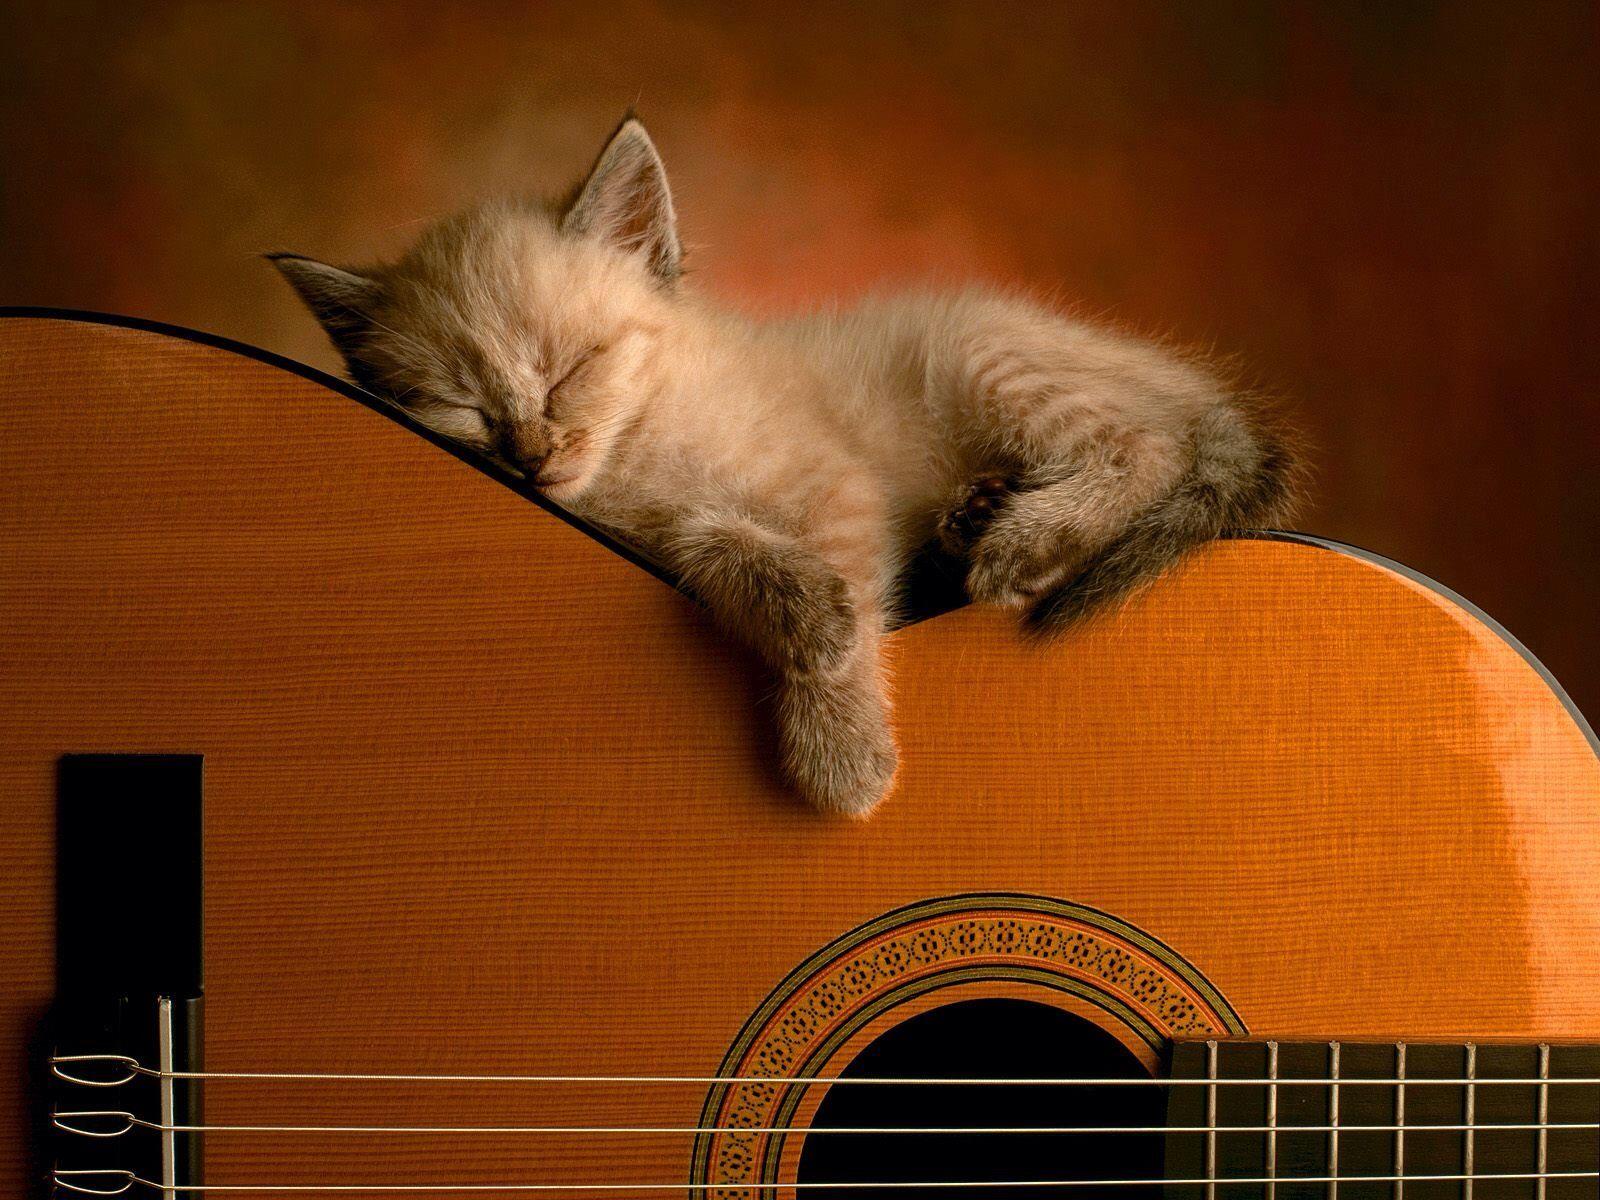 Guitar With A Kitten Sleeping Sleeping Kitten Funny Cat Wallpaper Kittens Cutest